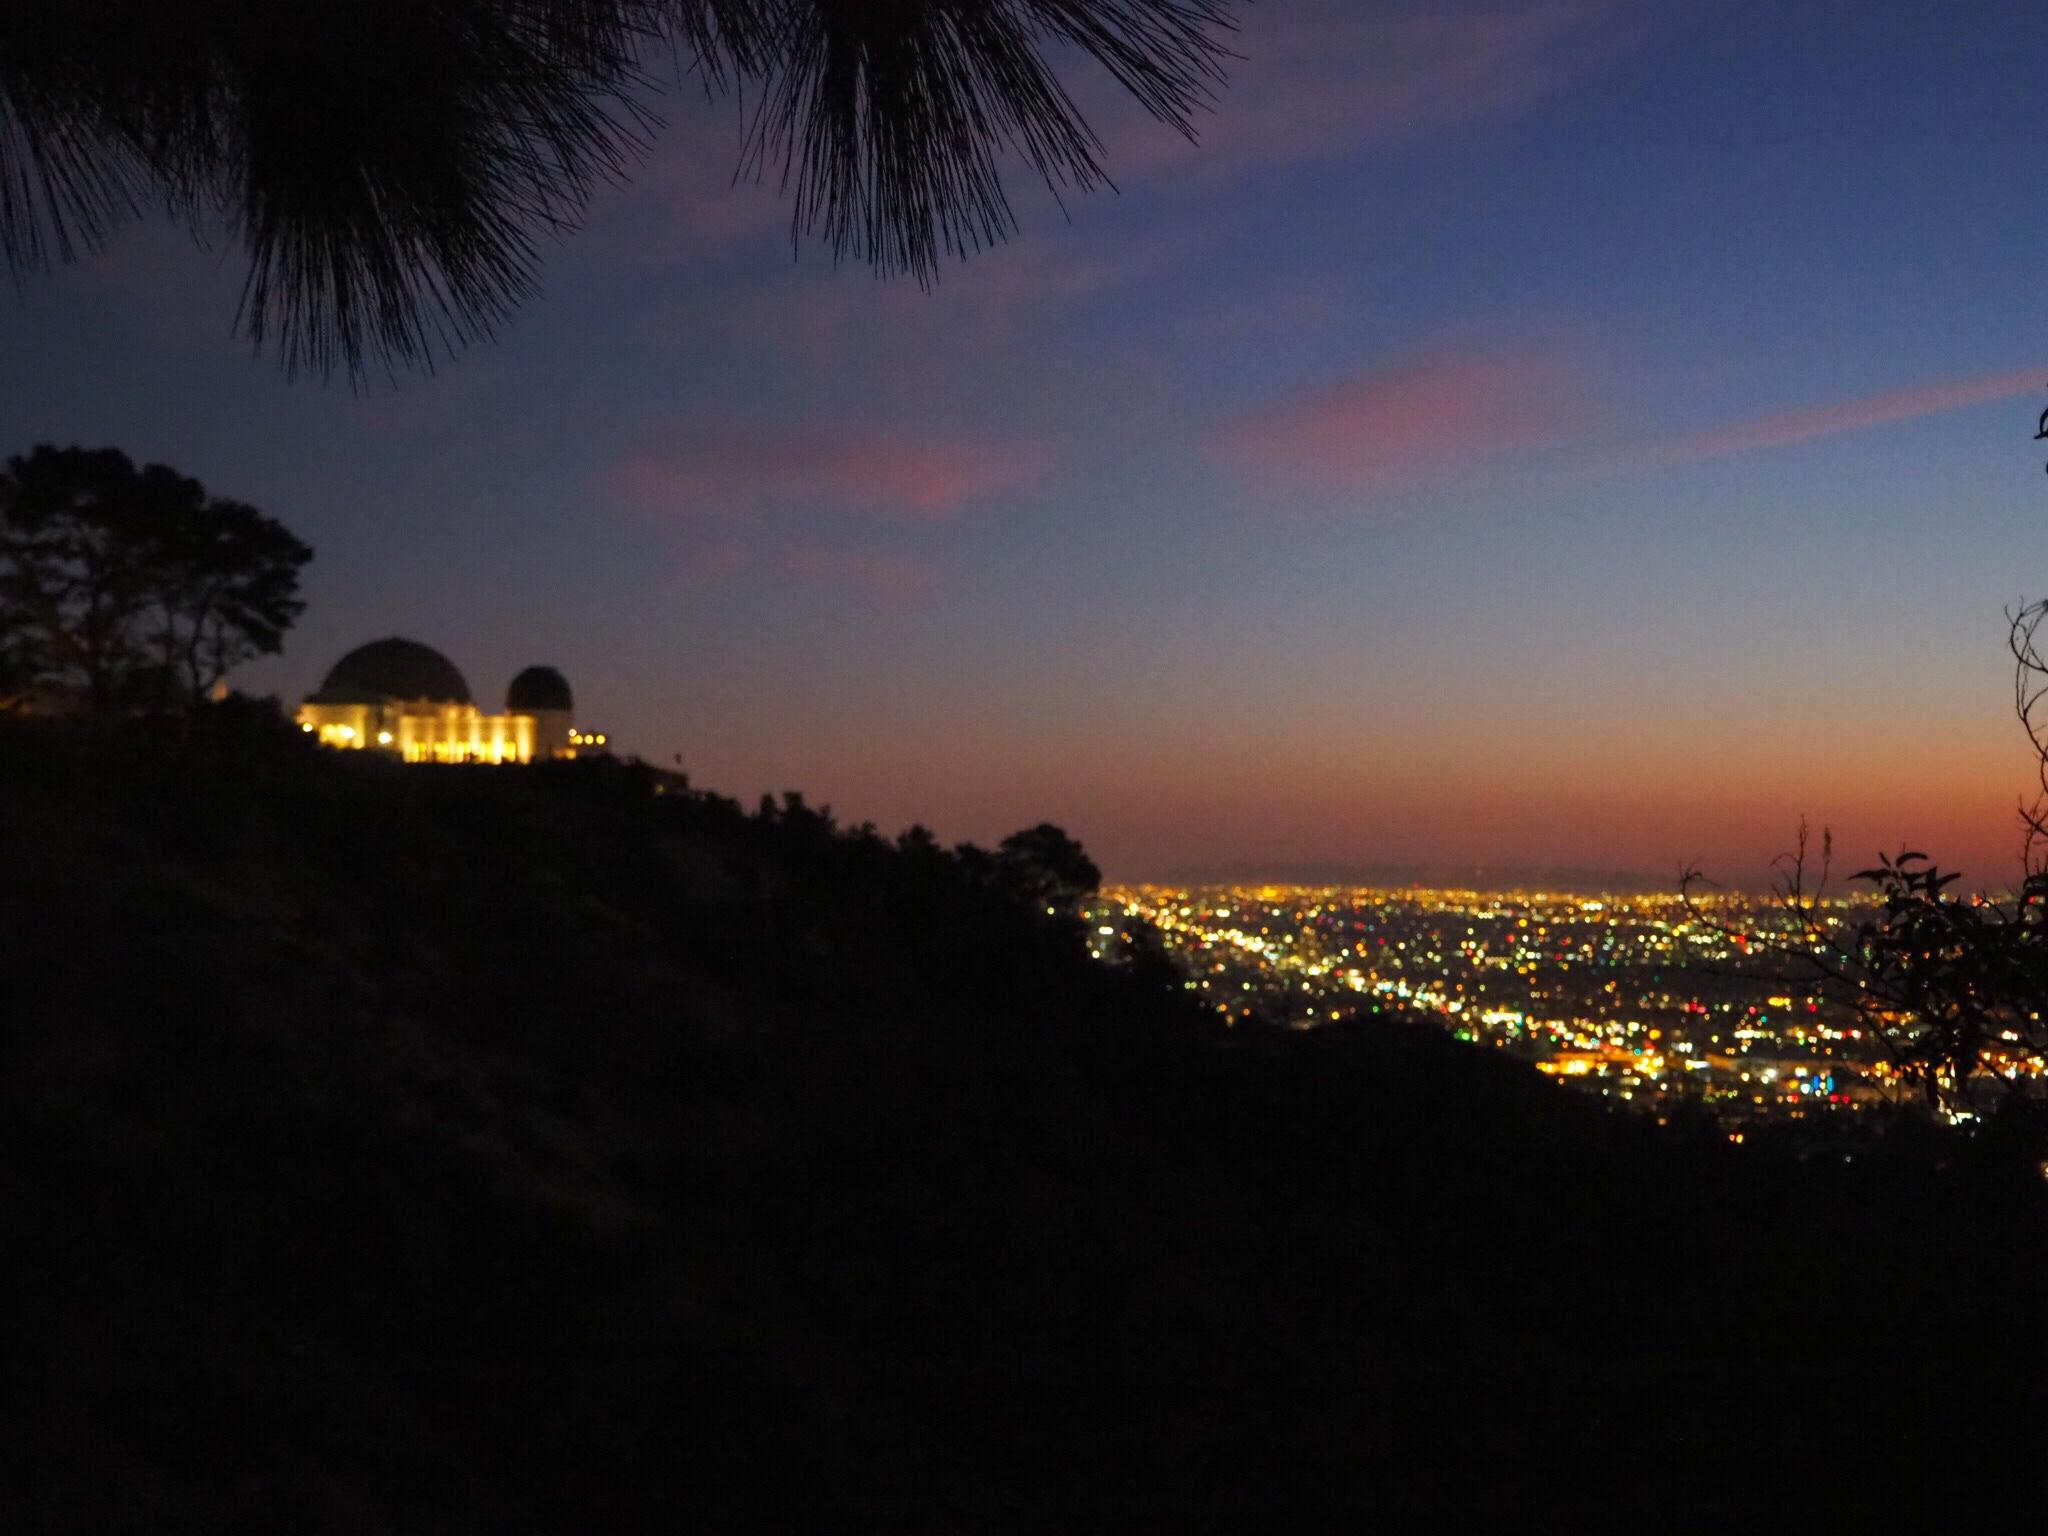 img 2375 - 24hours in LA - ロサンゼルスで過ごした24時間